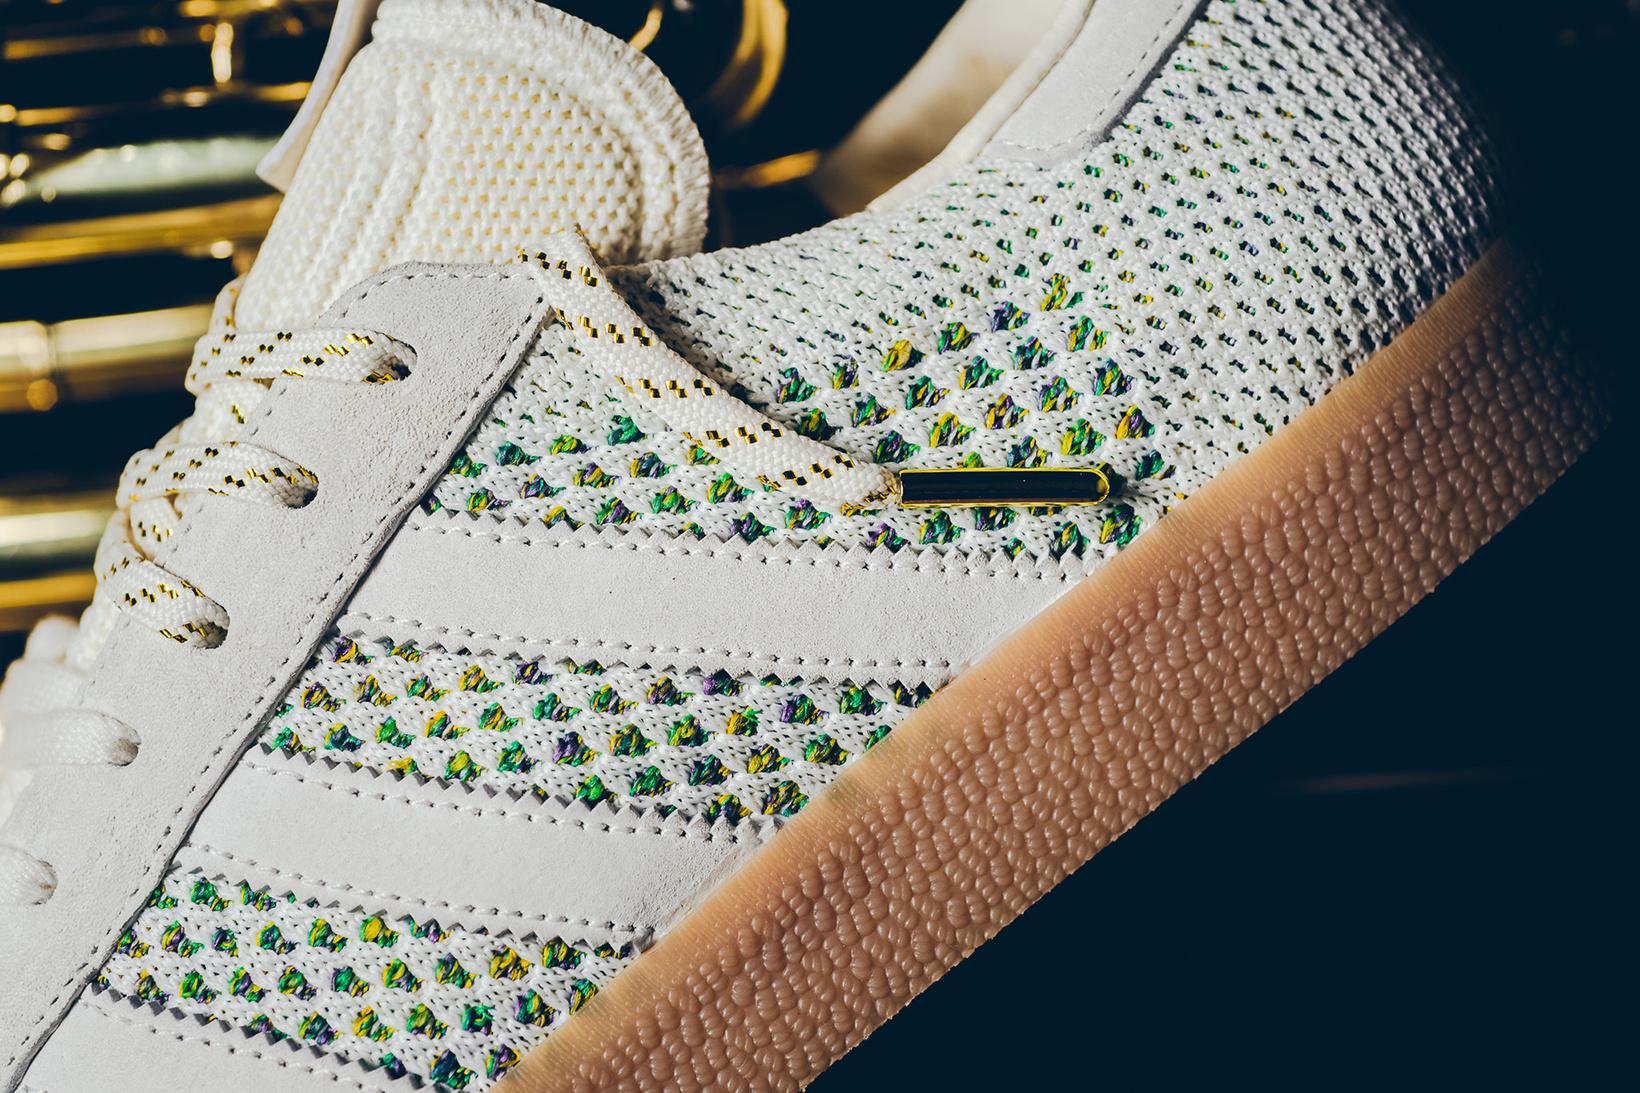 adidas Consortium Sneaker Politics x adidas Gazelle PK 'Mardi Gras' Unboxing